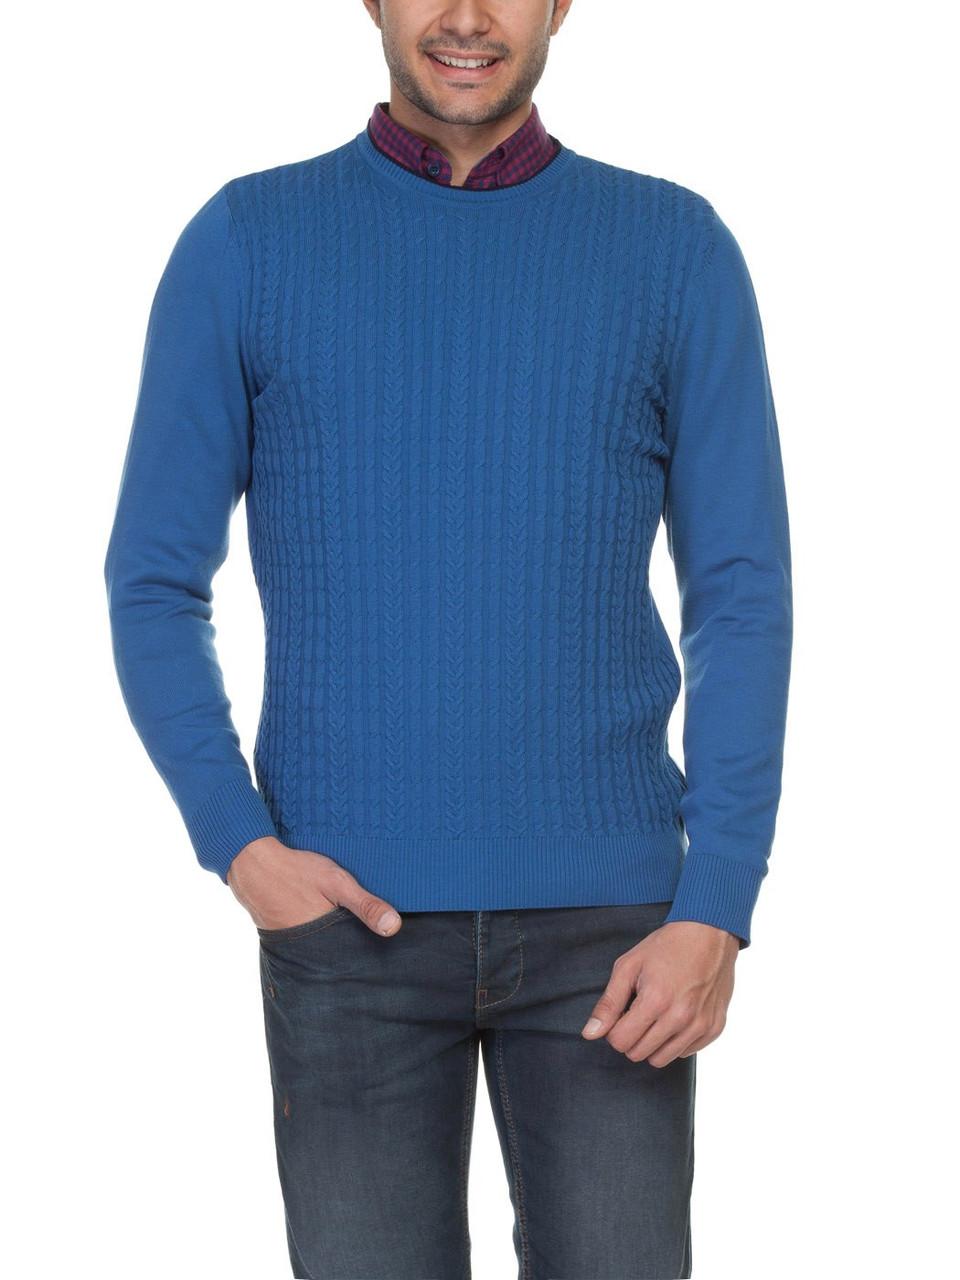 Мужской синий свитер LC Waikiki в мелкую косичку